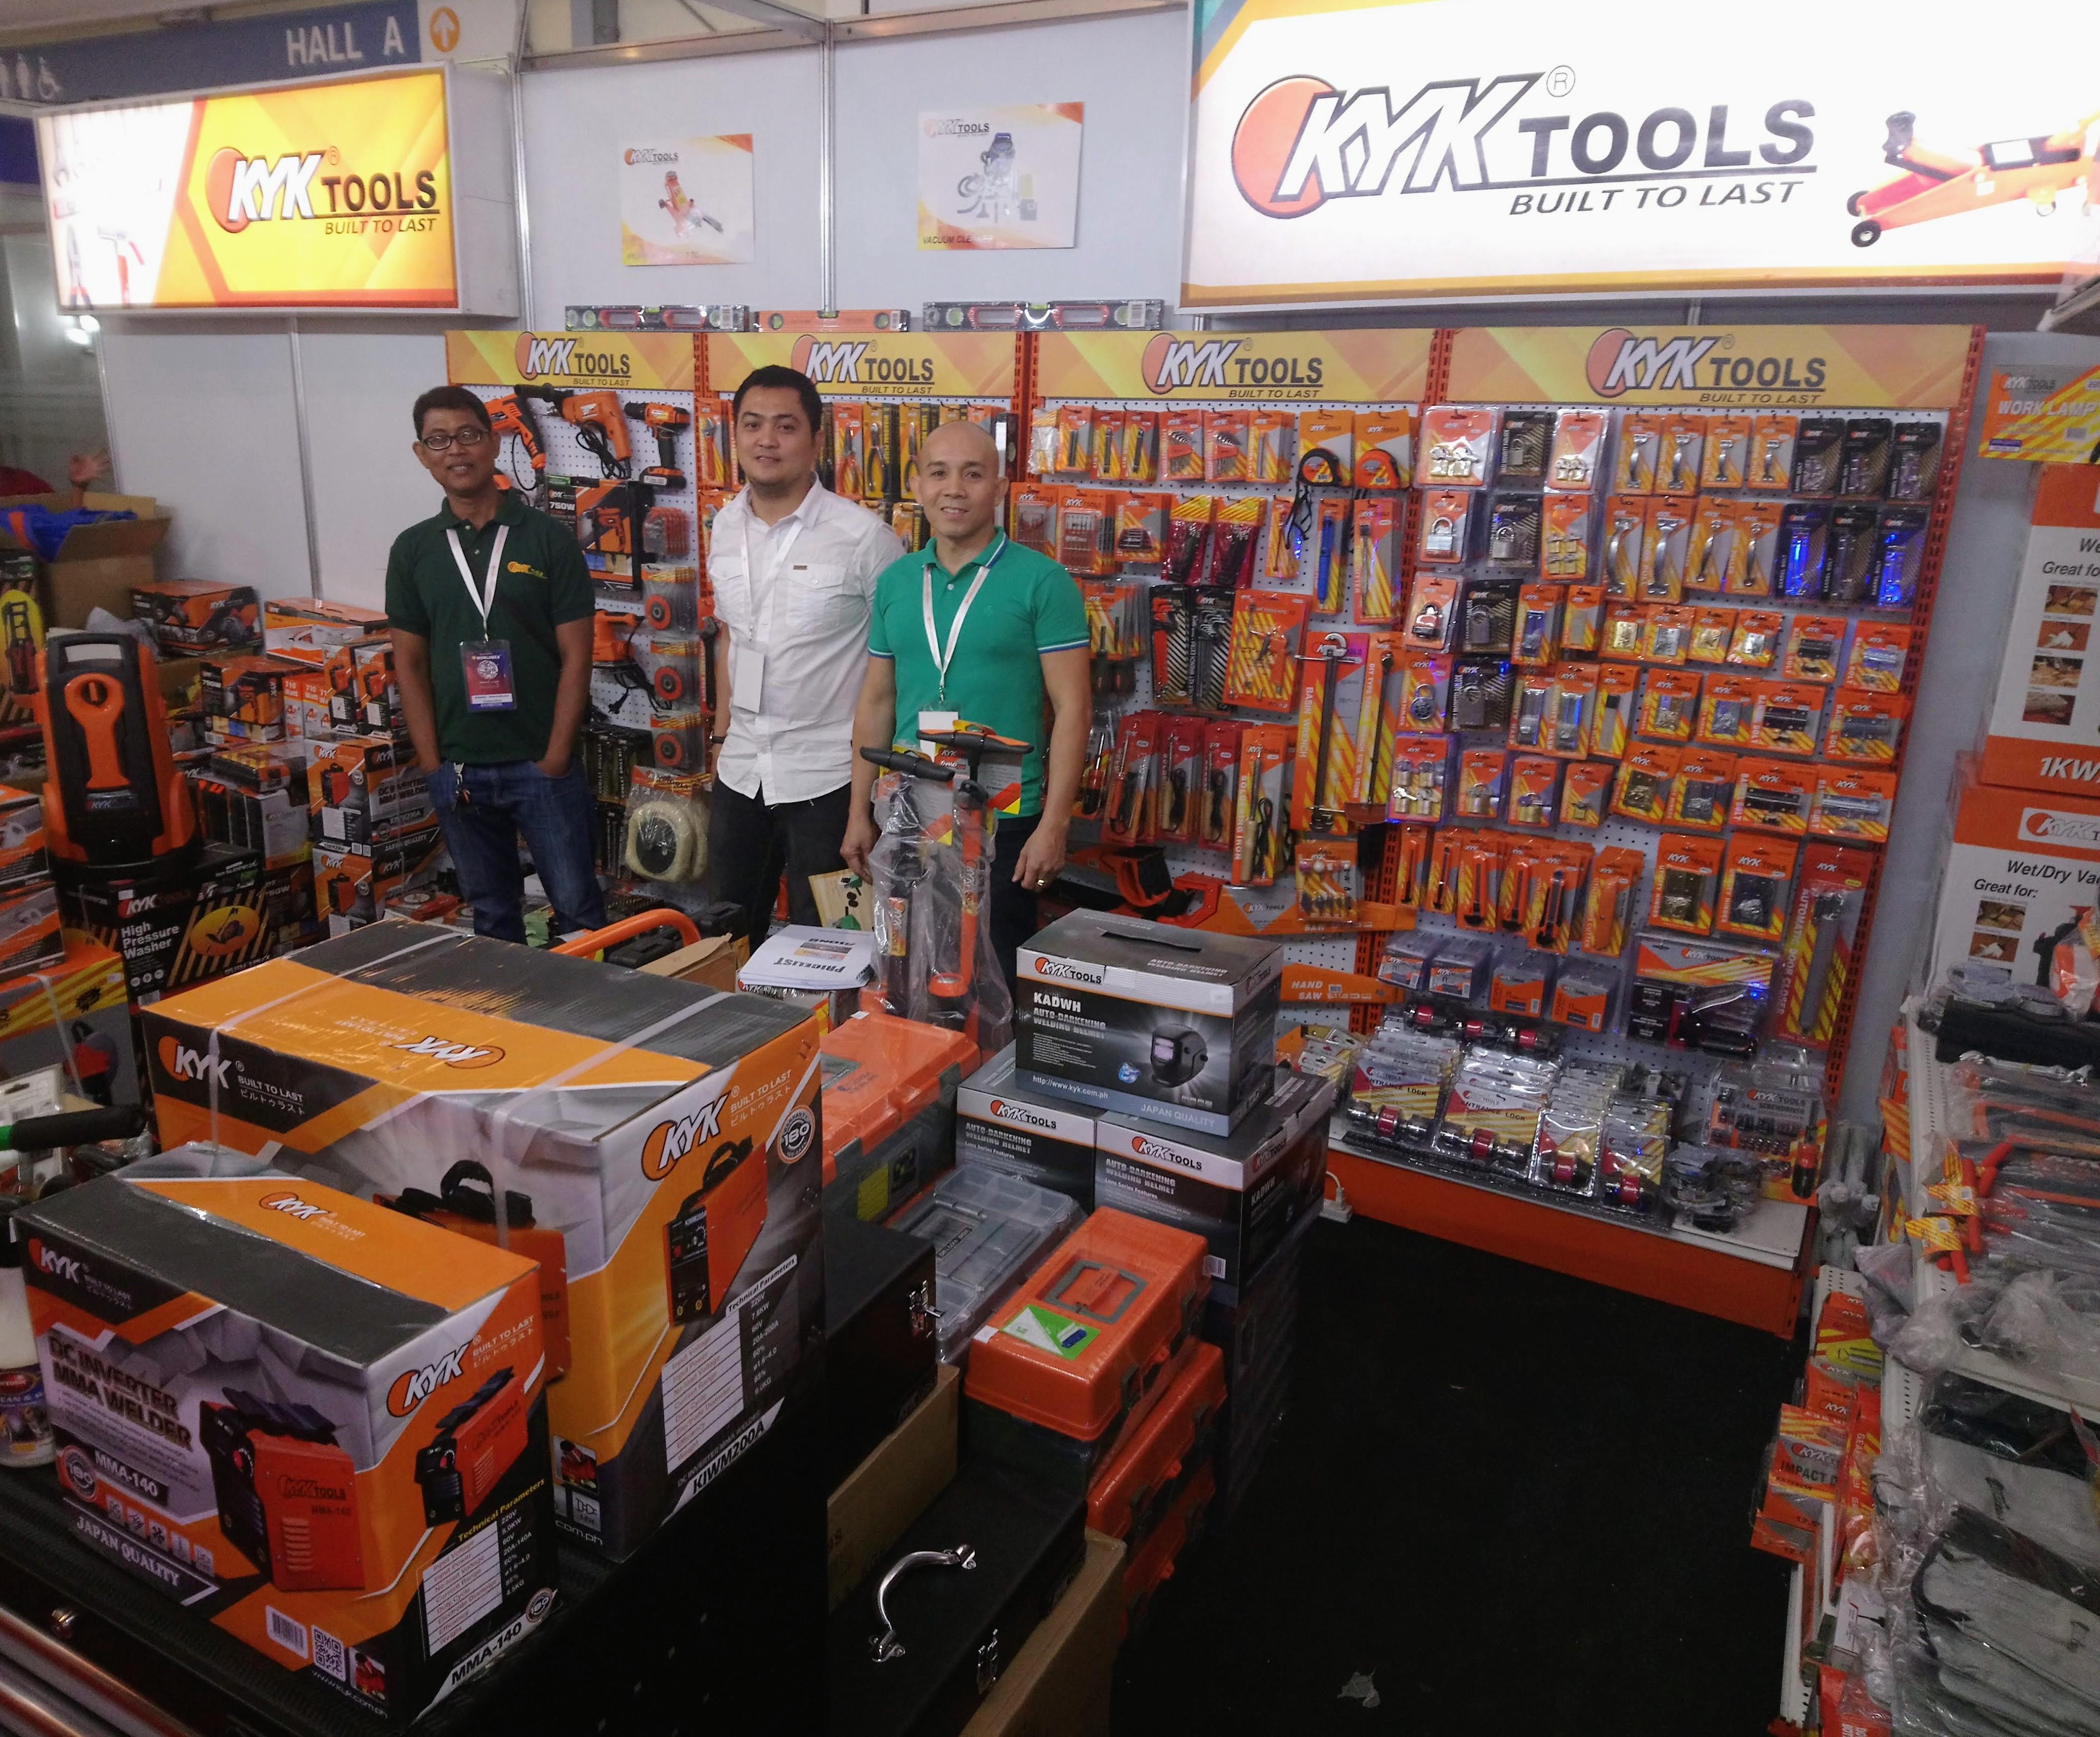 kyk-tools